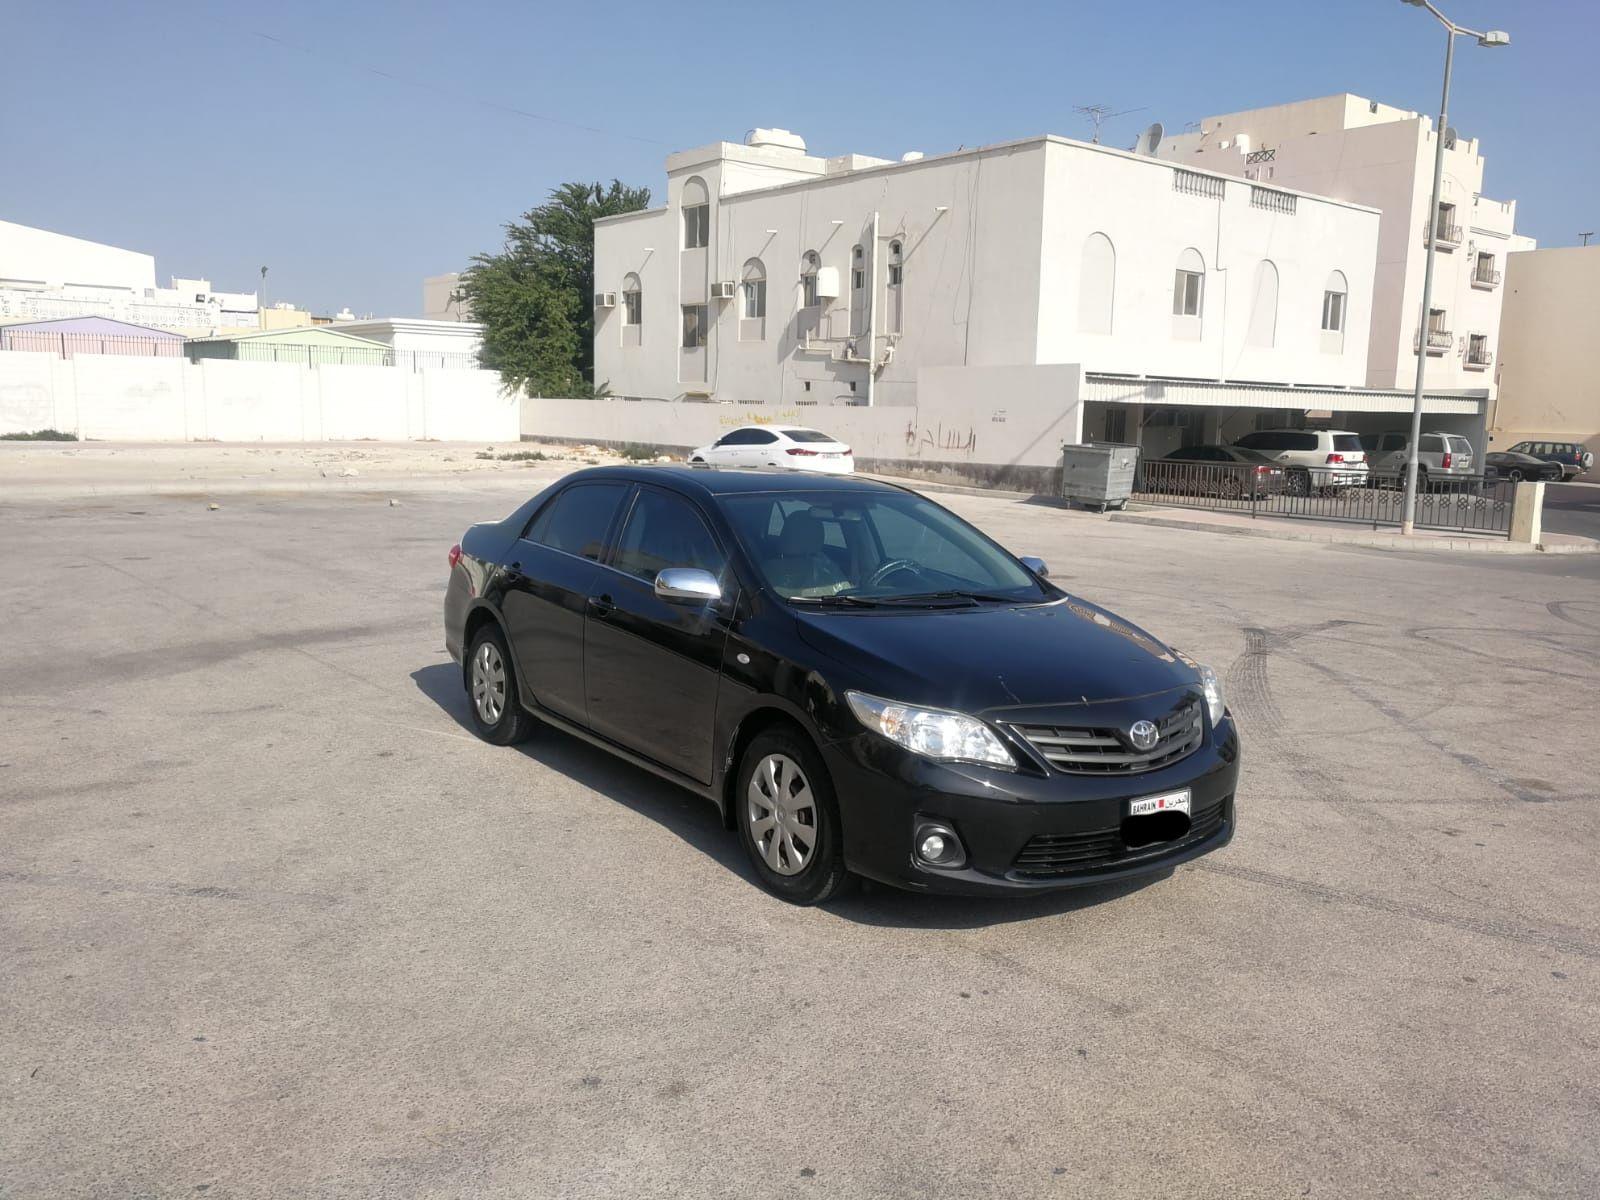 Toyota Corolla XLI 2012 (Black)